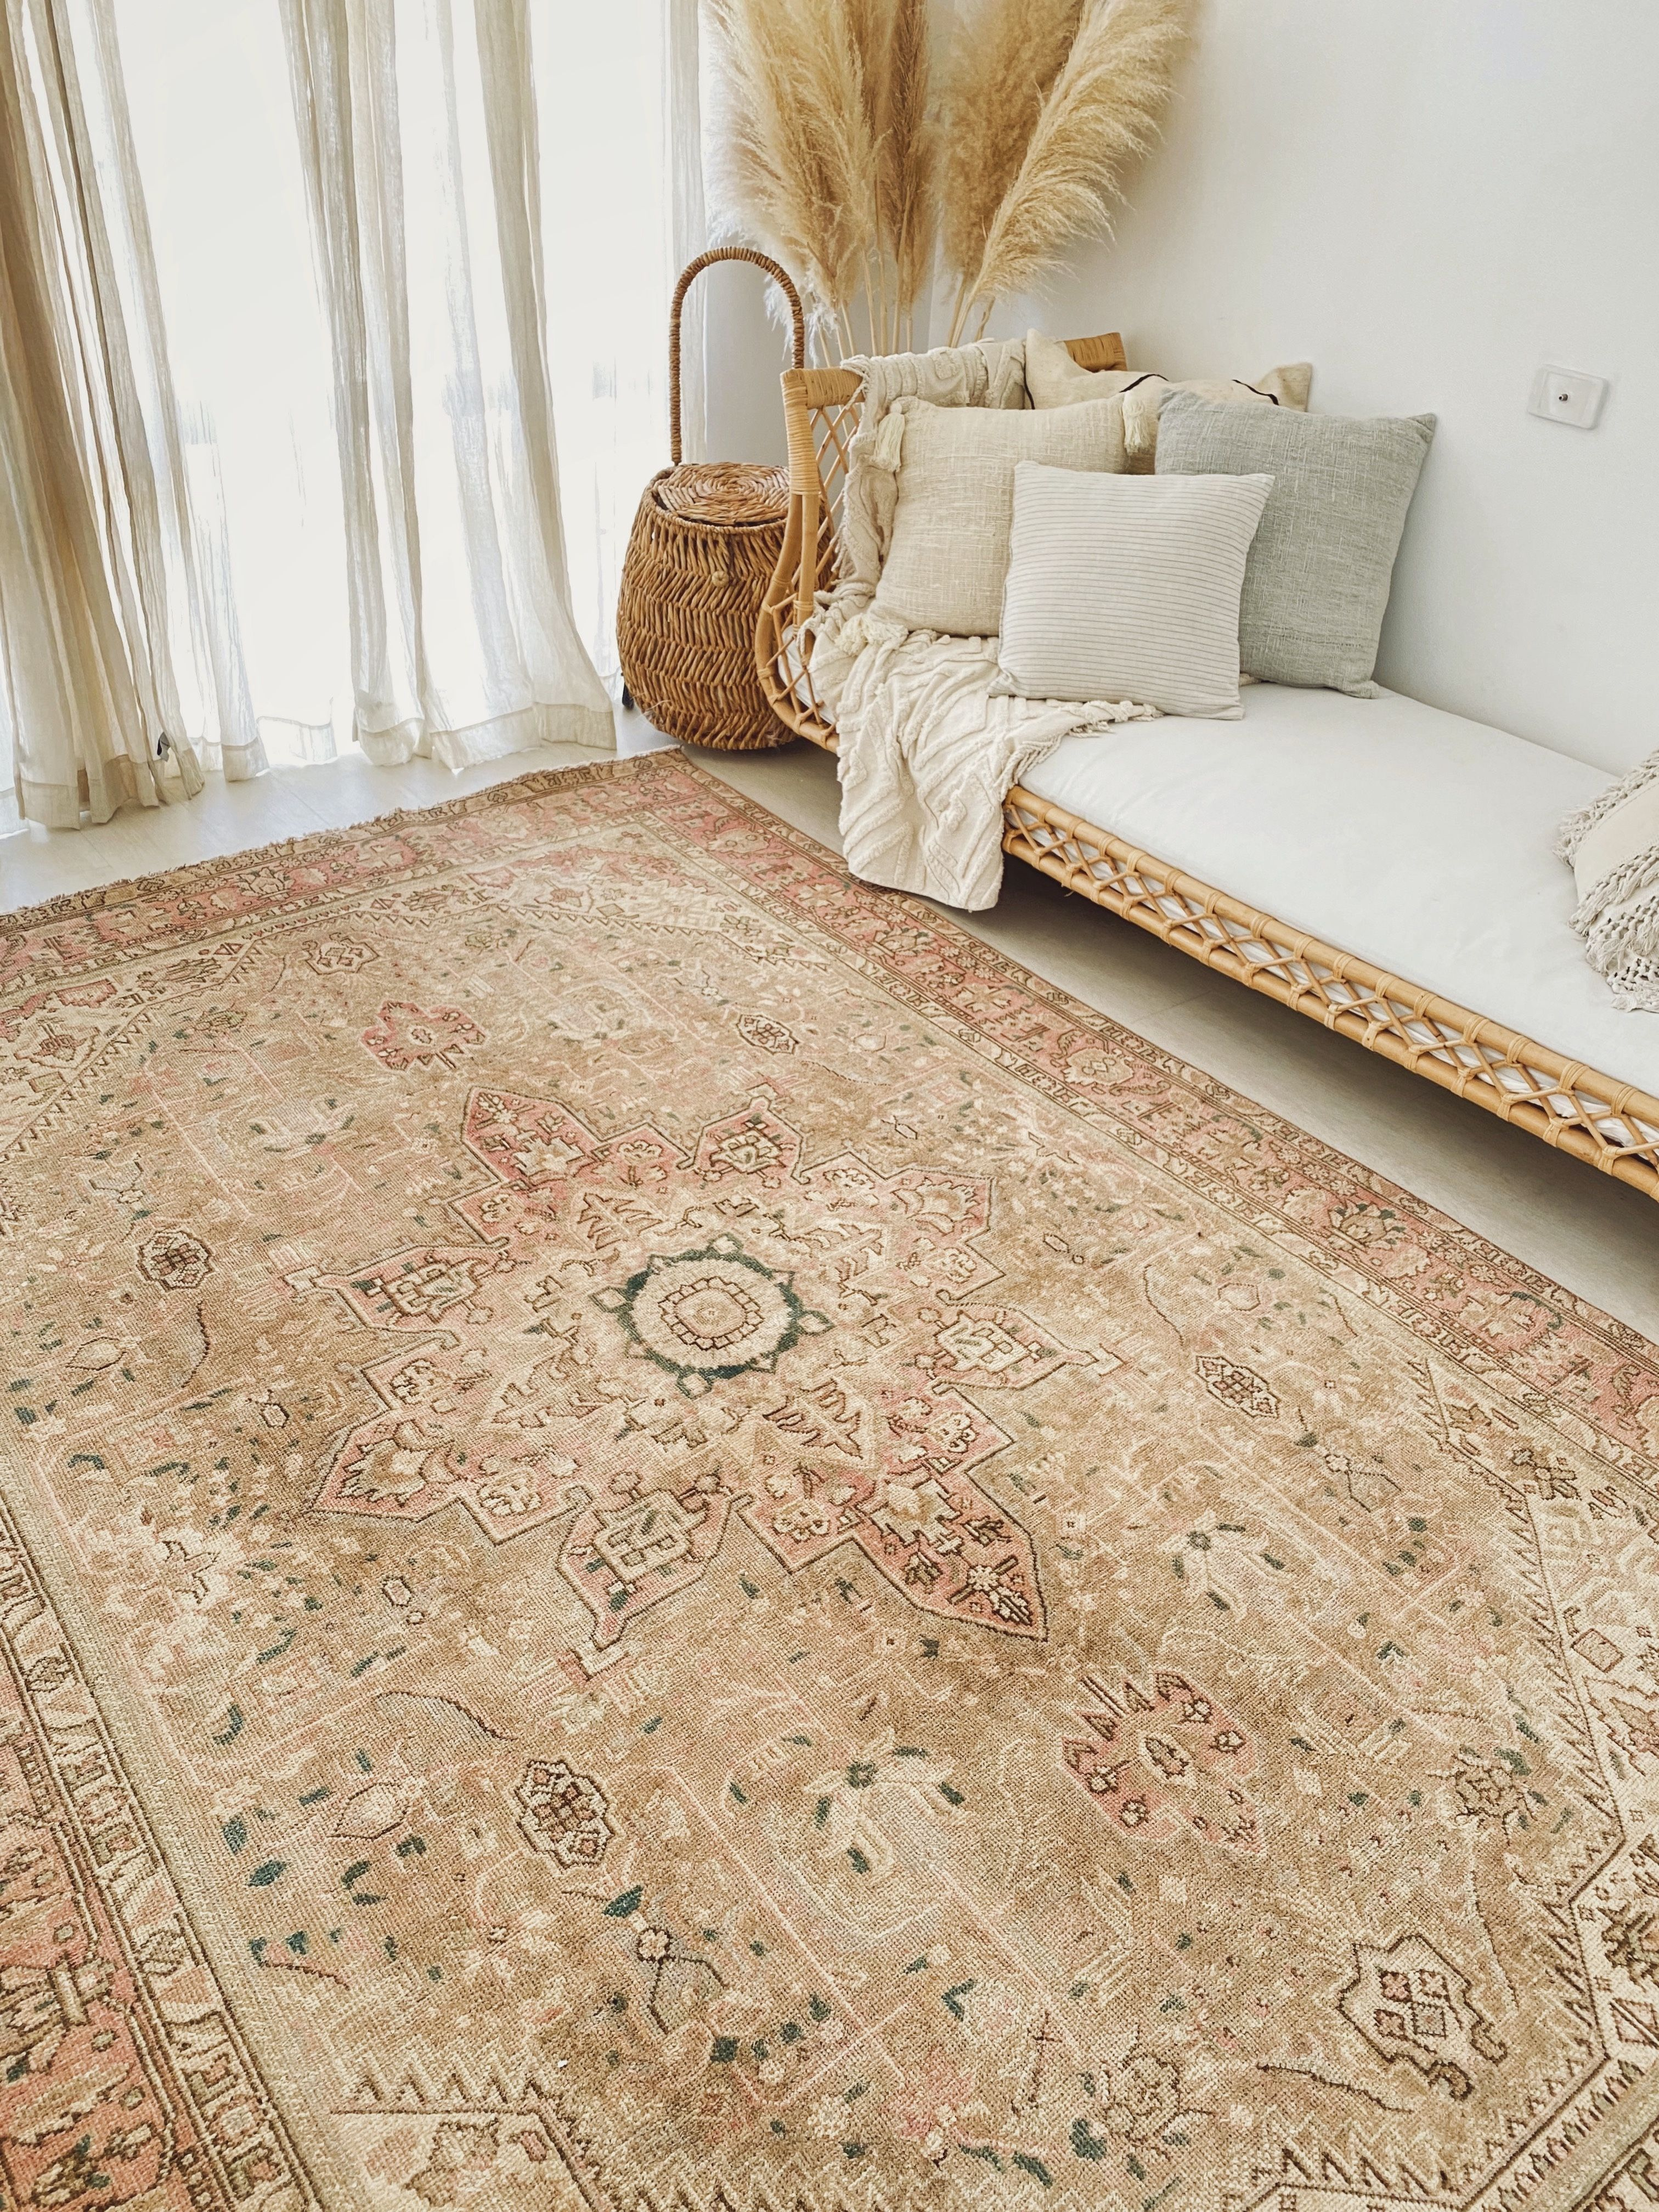 Kitchen Runner Idea In 2020 Turkish Rug Living Room House Interior Decor Rugs In Living Room